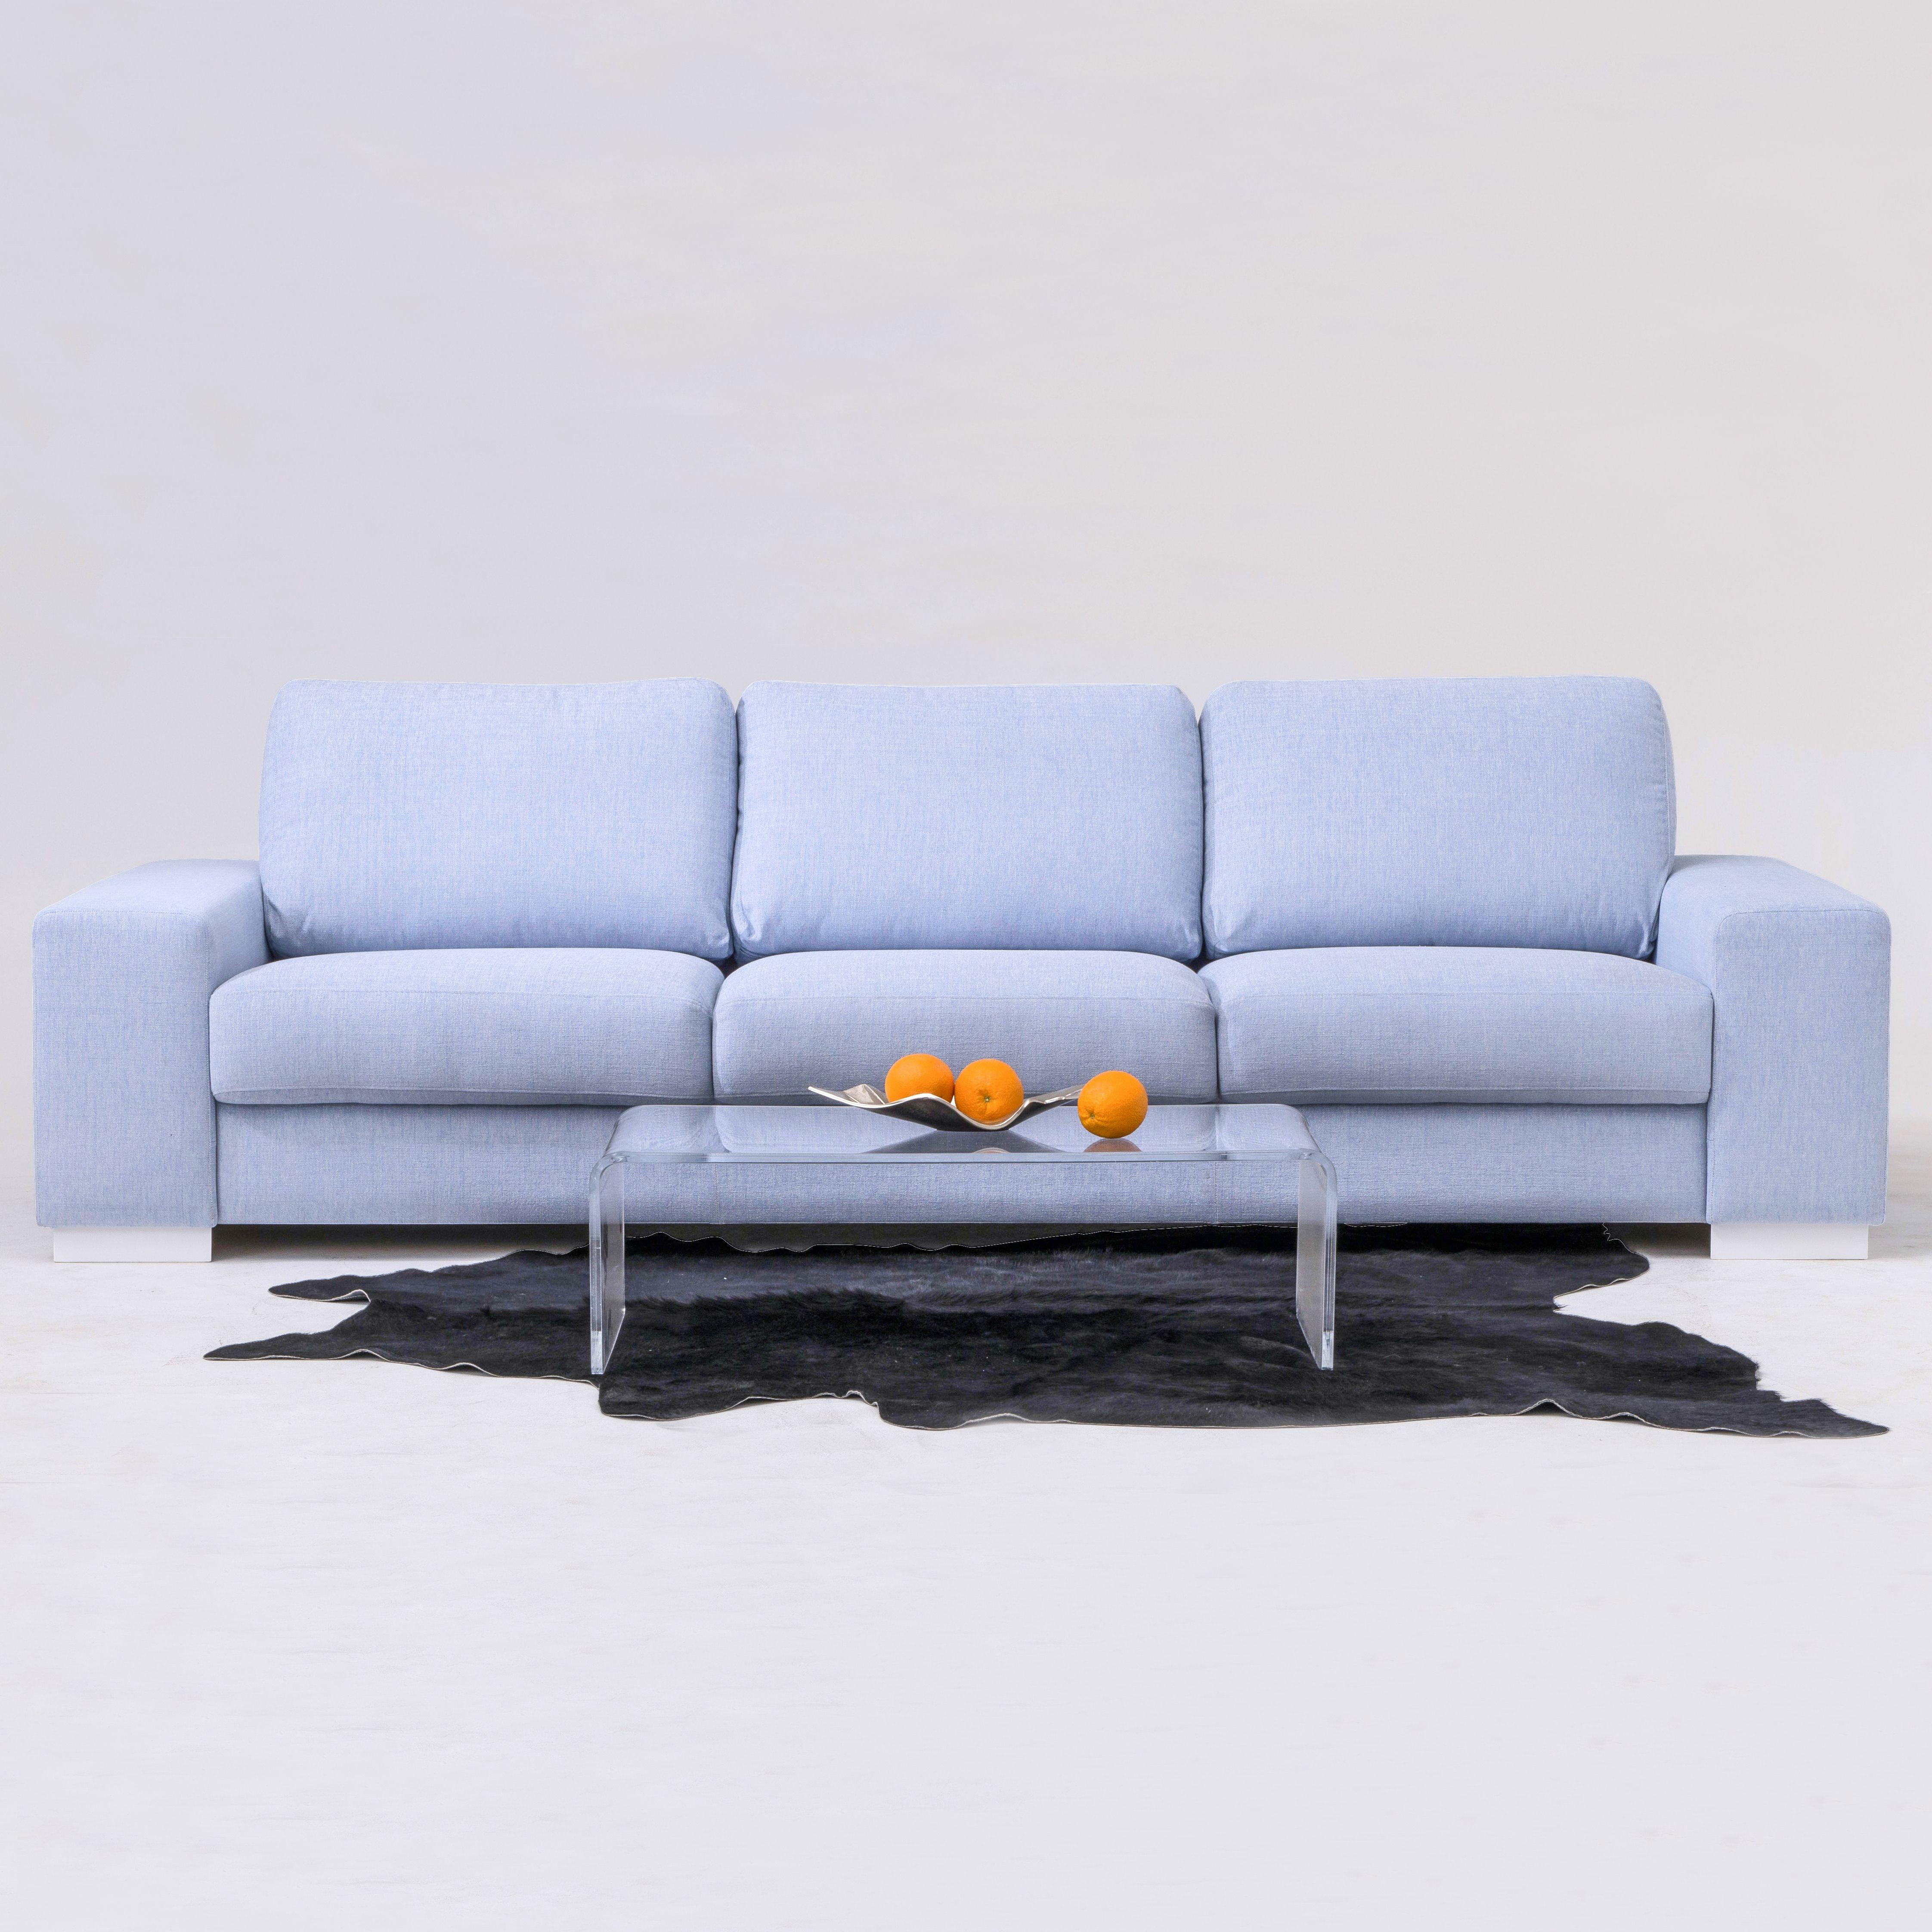 avandeo sofa amazing sofas u ecksofas online kaufen. Black Bedroom Furniture Sets. Home Design Ideas